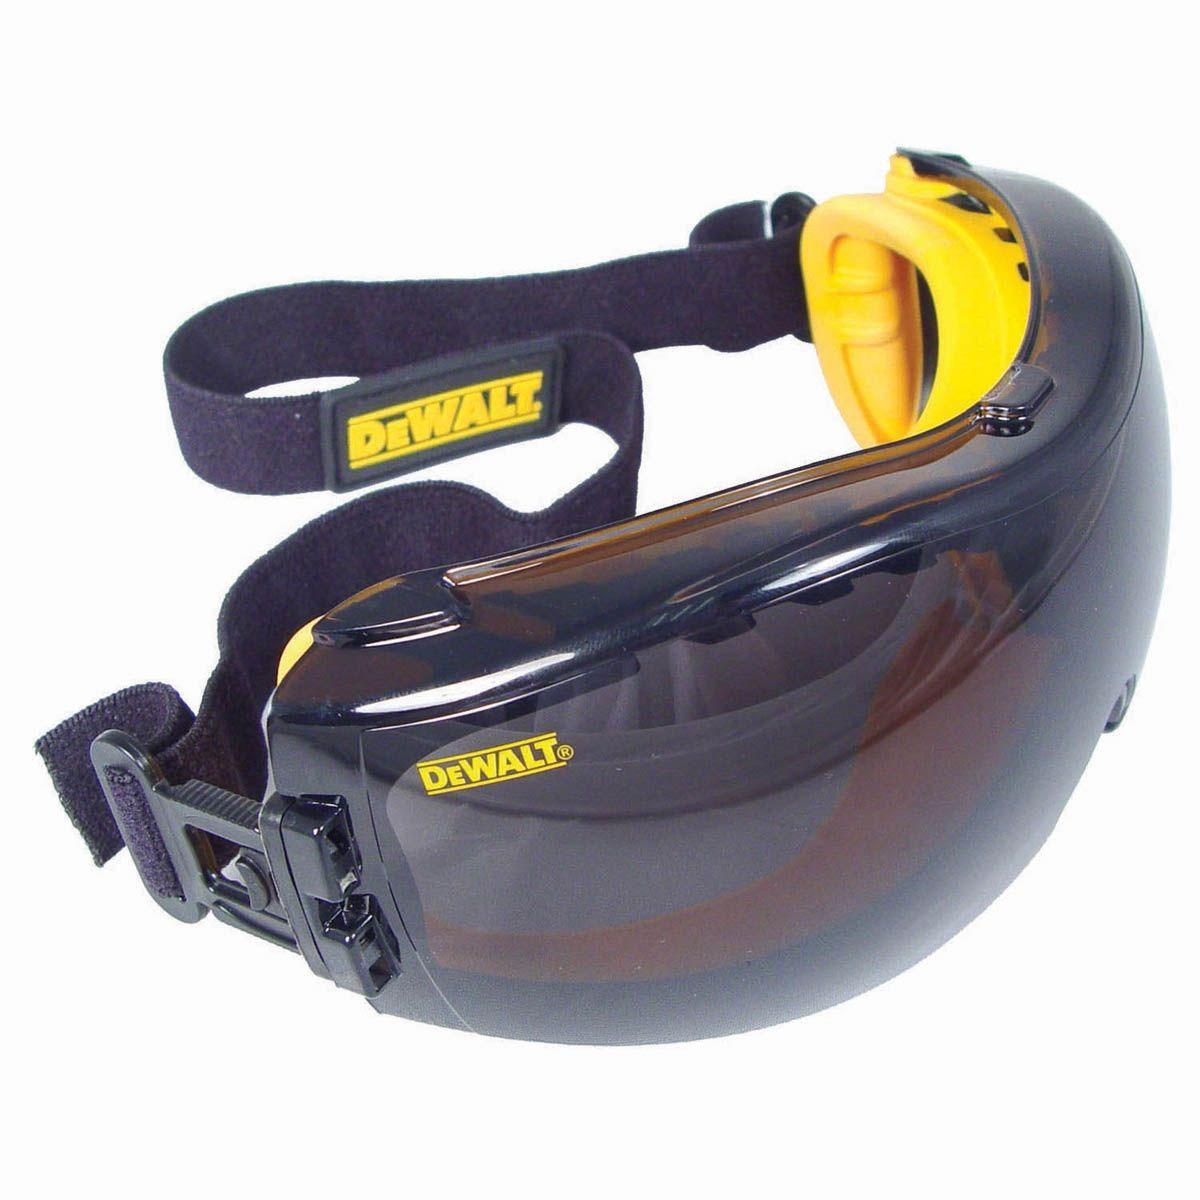 Dewalt dpg8221 concealer goggles yellow frame smoke